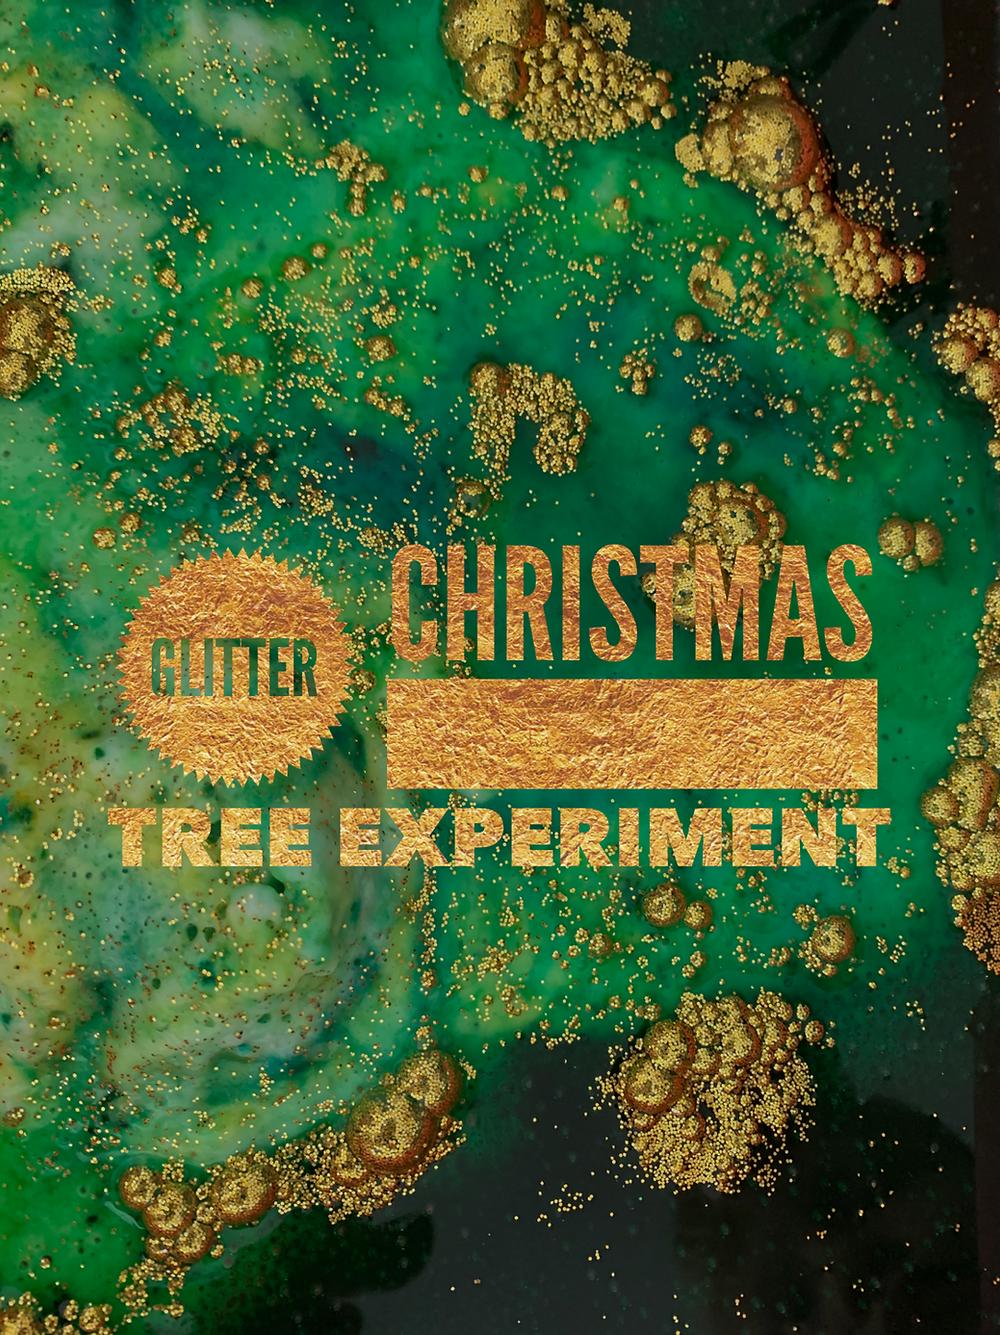 Glitter Christmas Tree Experiment for Kids